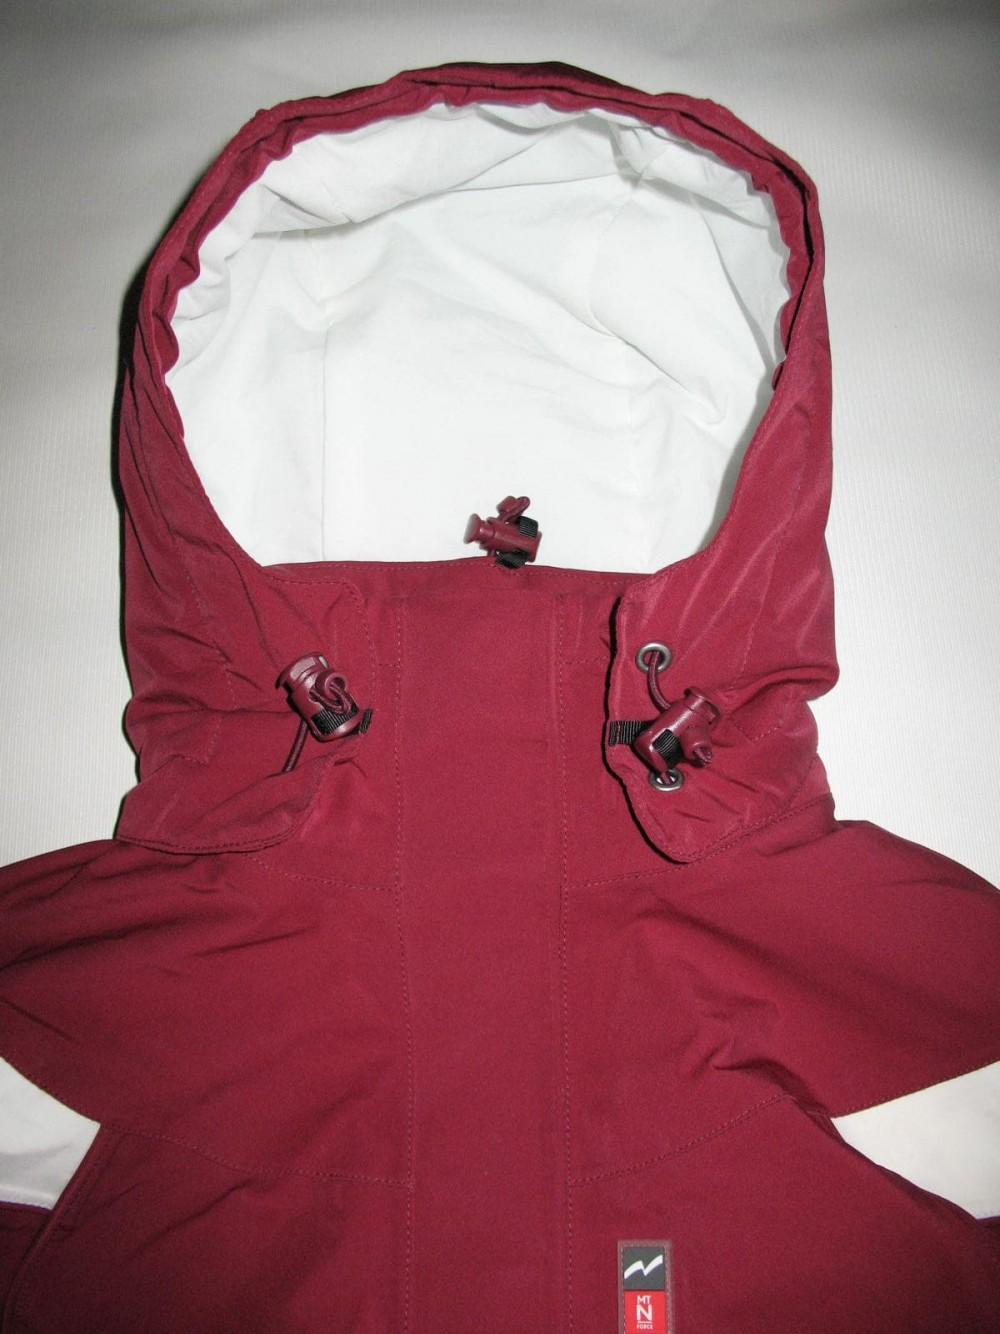 Куртка MOUNTAIN FORCE outdoor jacket lady (размер 36/S) - 2